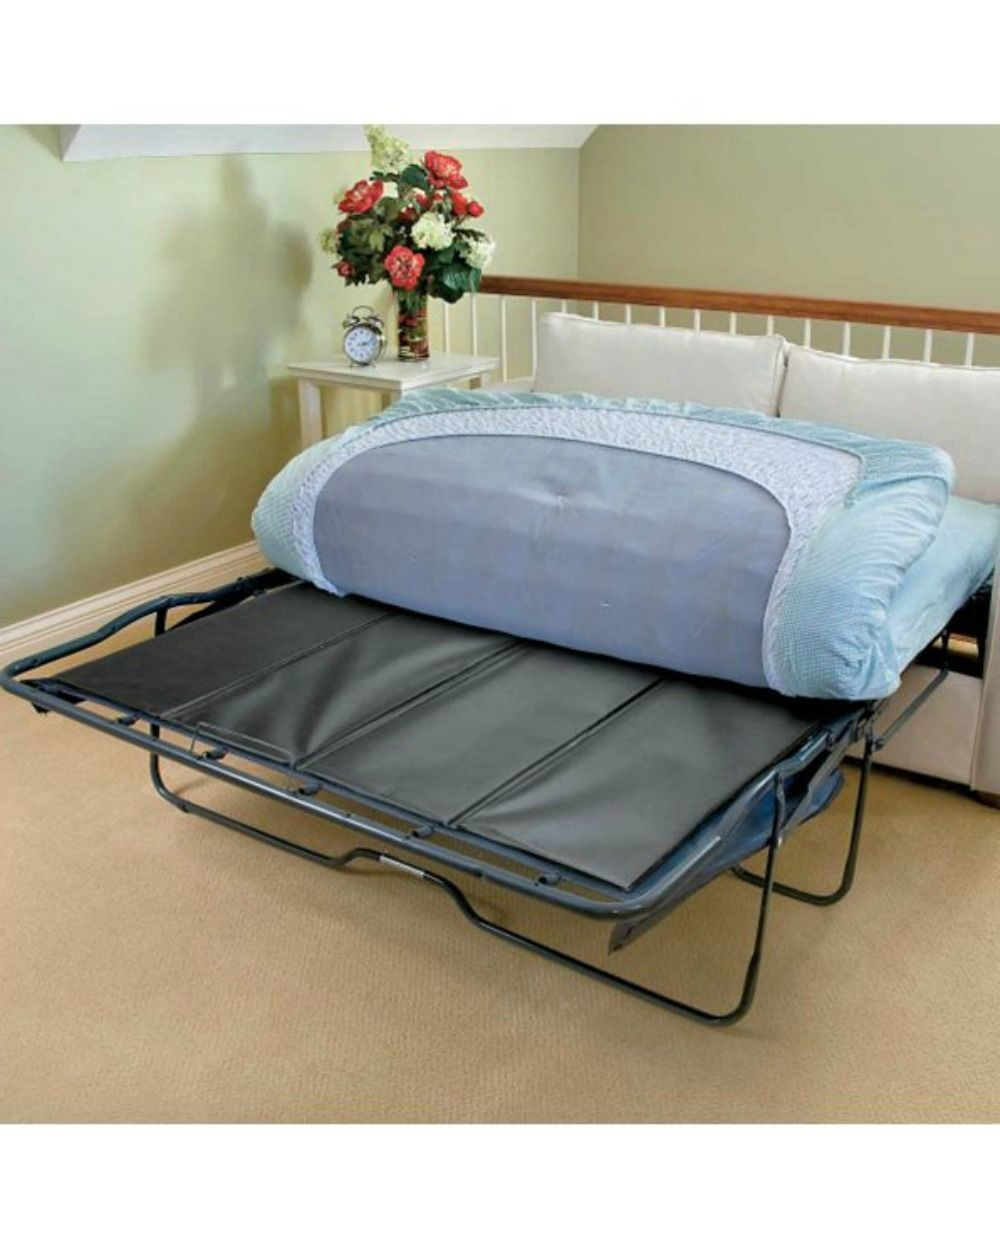 Sleeper Sofa Bed Bar Shield Folding Support Board For Under ...